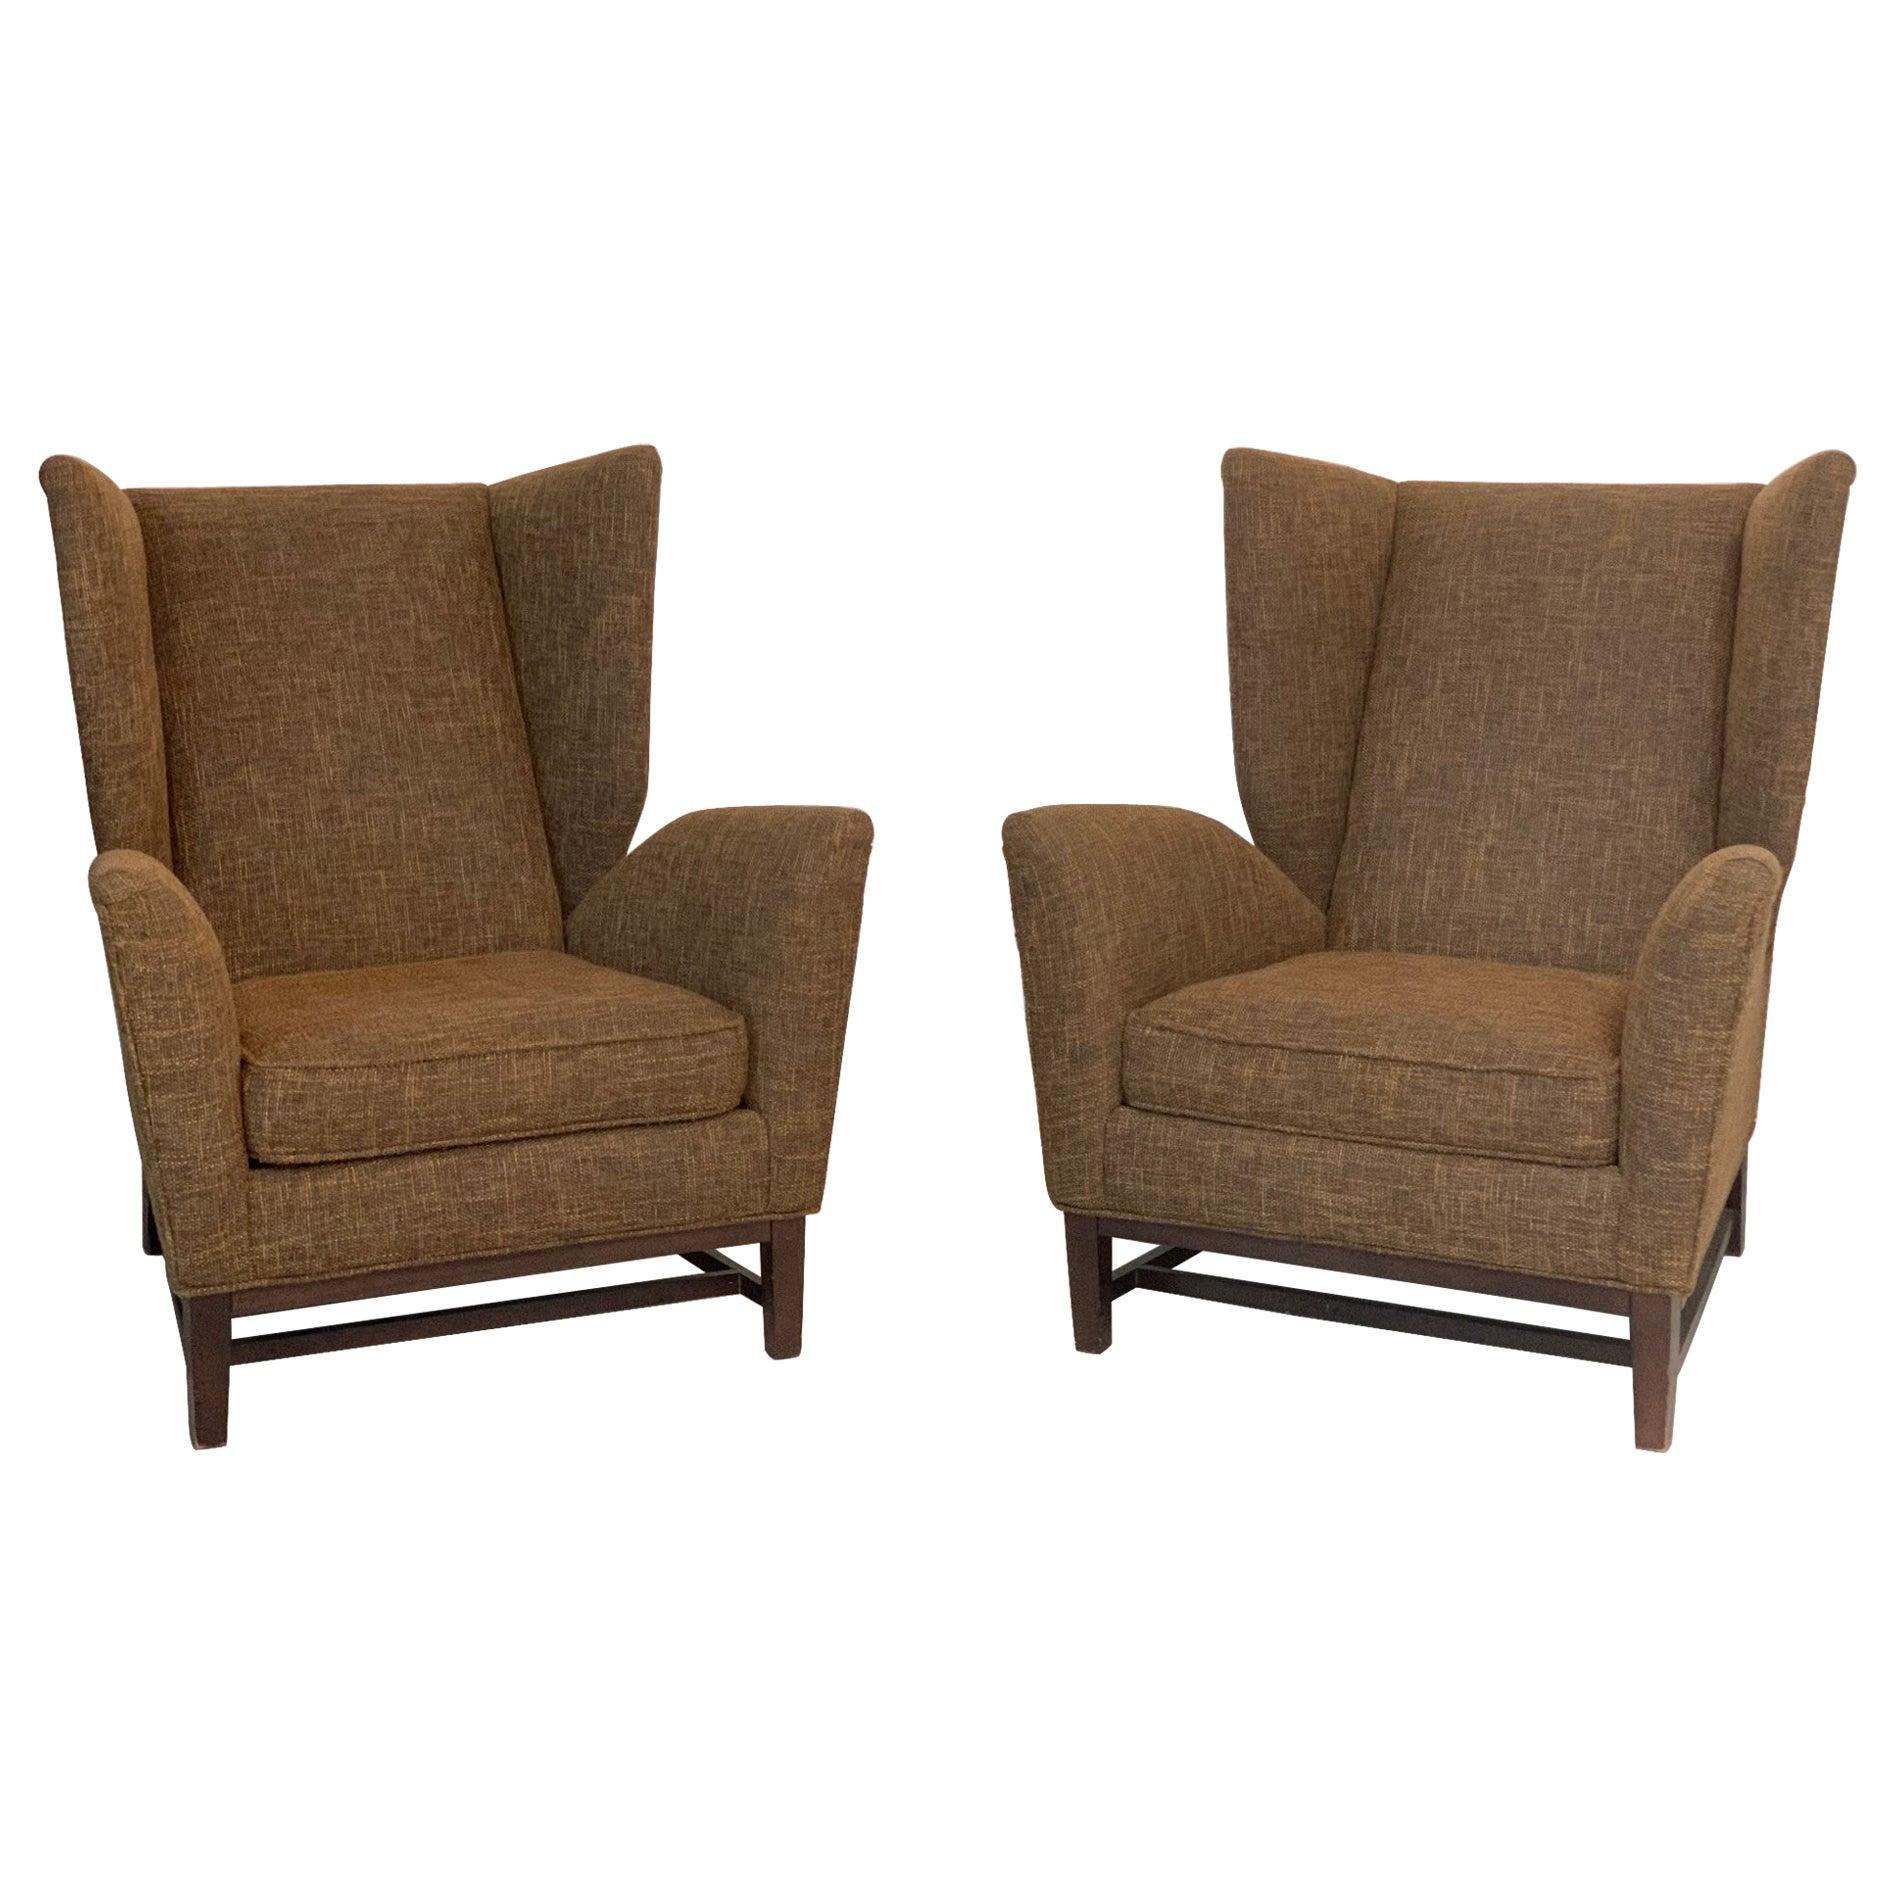 Pair of Italian Mid-Century Modern Wingback Lounge Chairs